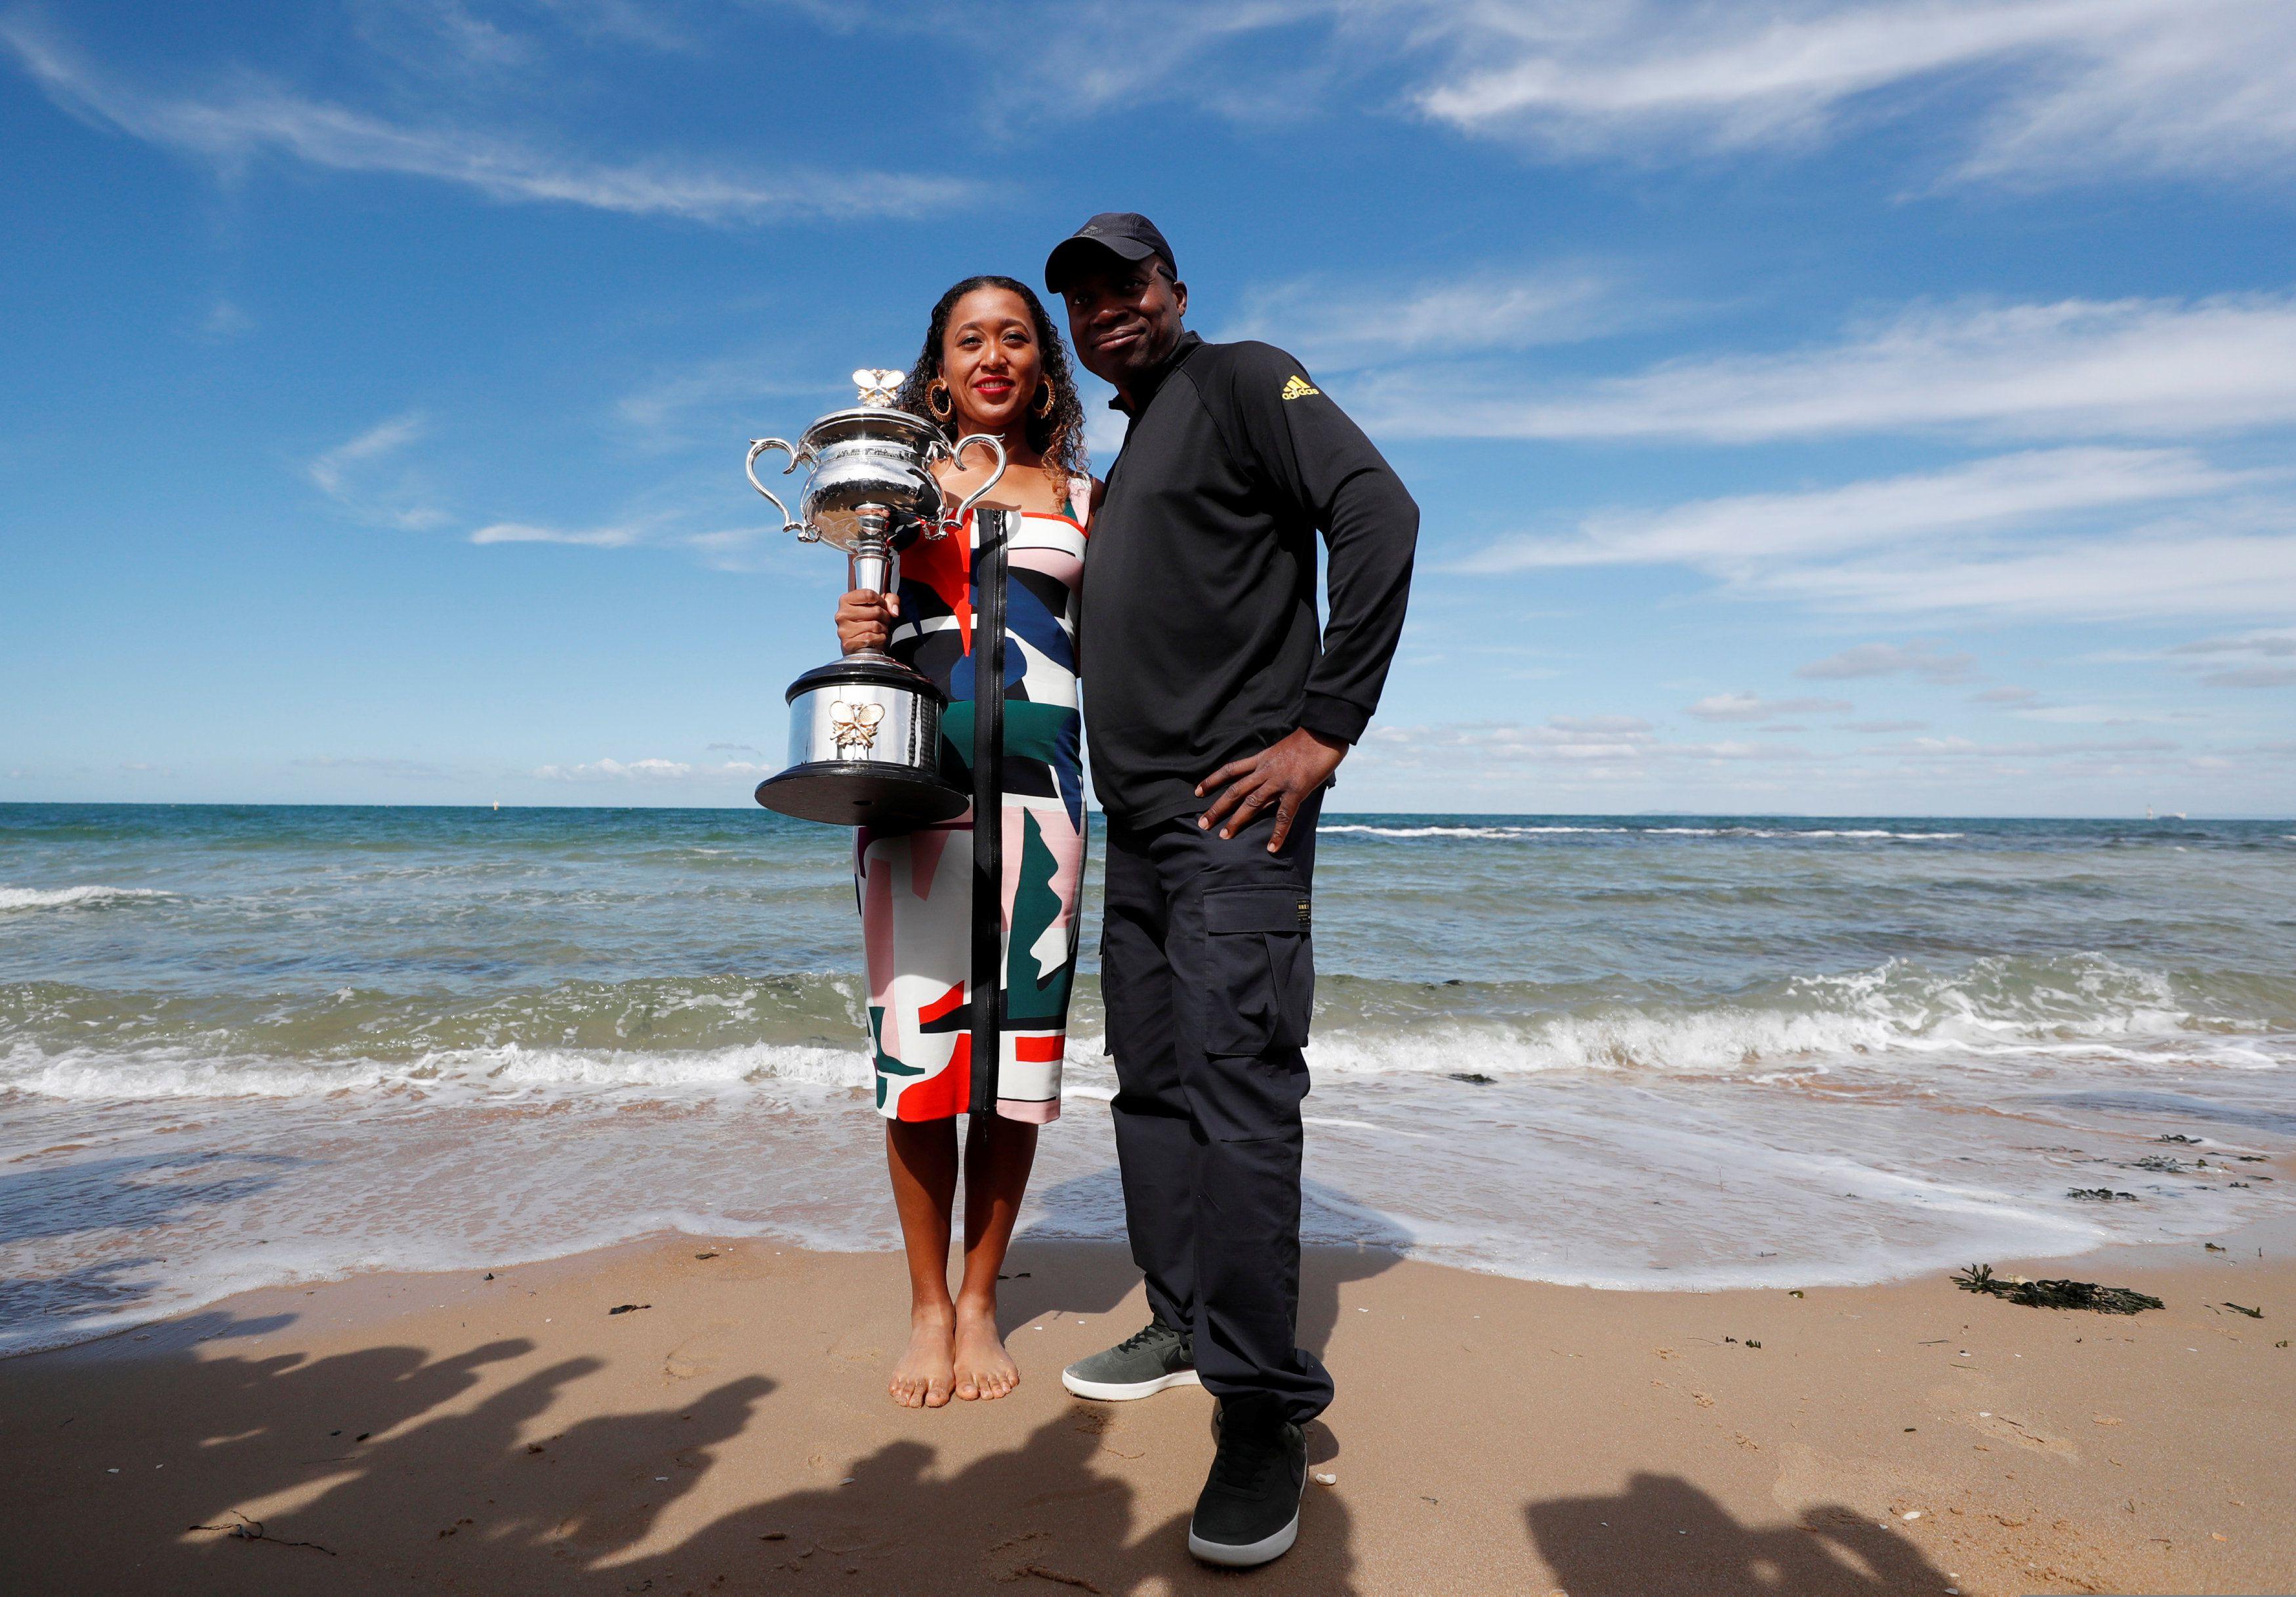 Naomi Osaka con su padre Leonard Francois tras ganar el Australian Open en 2019 (Foto: Reuters)